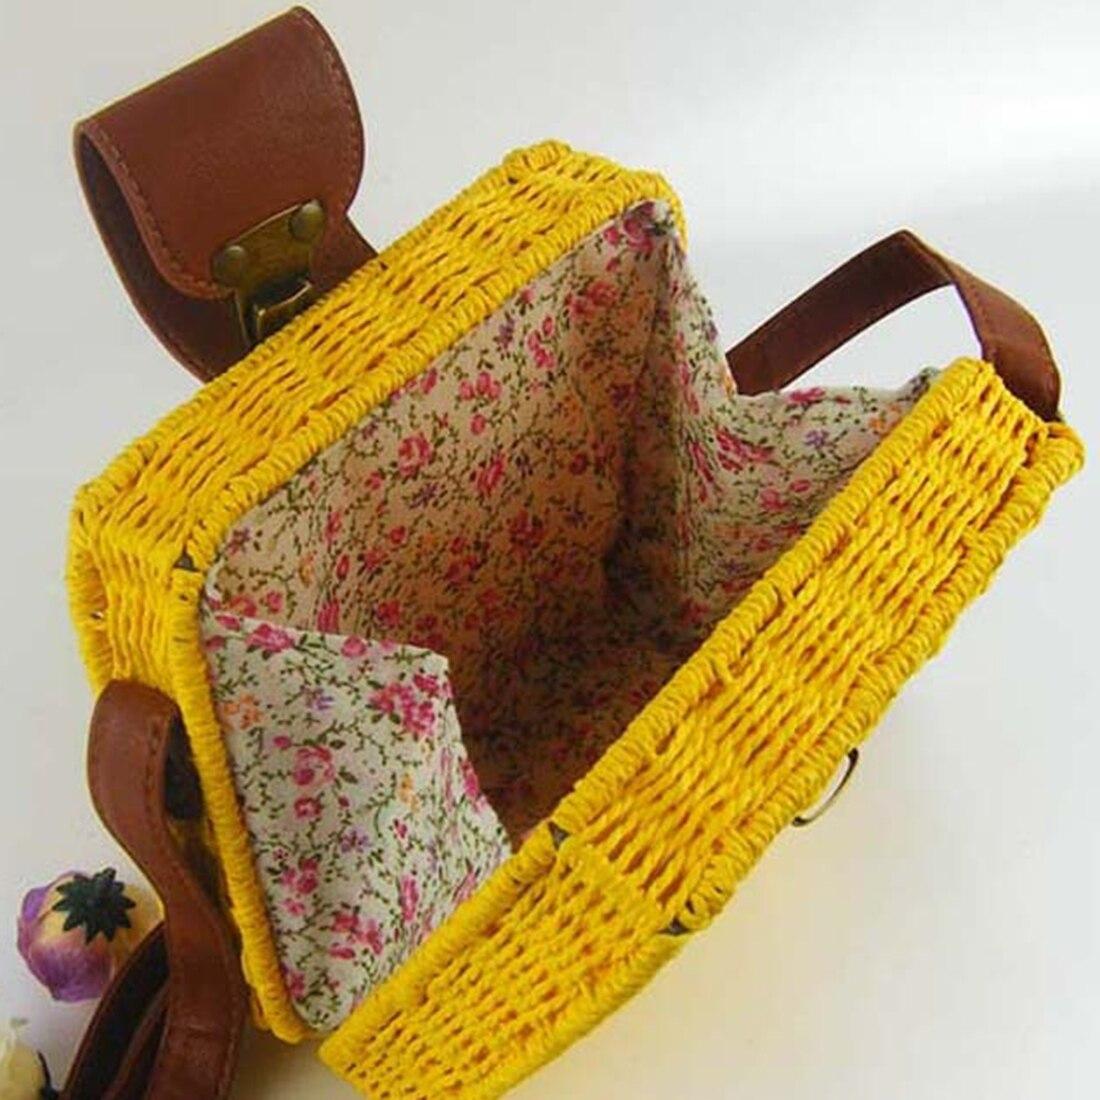 women's handbags mini women messenger bags leather Square Straw ladies Crossbody Bag shoulder bags summer bolsa feminina 2018